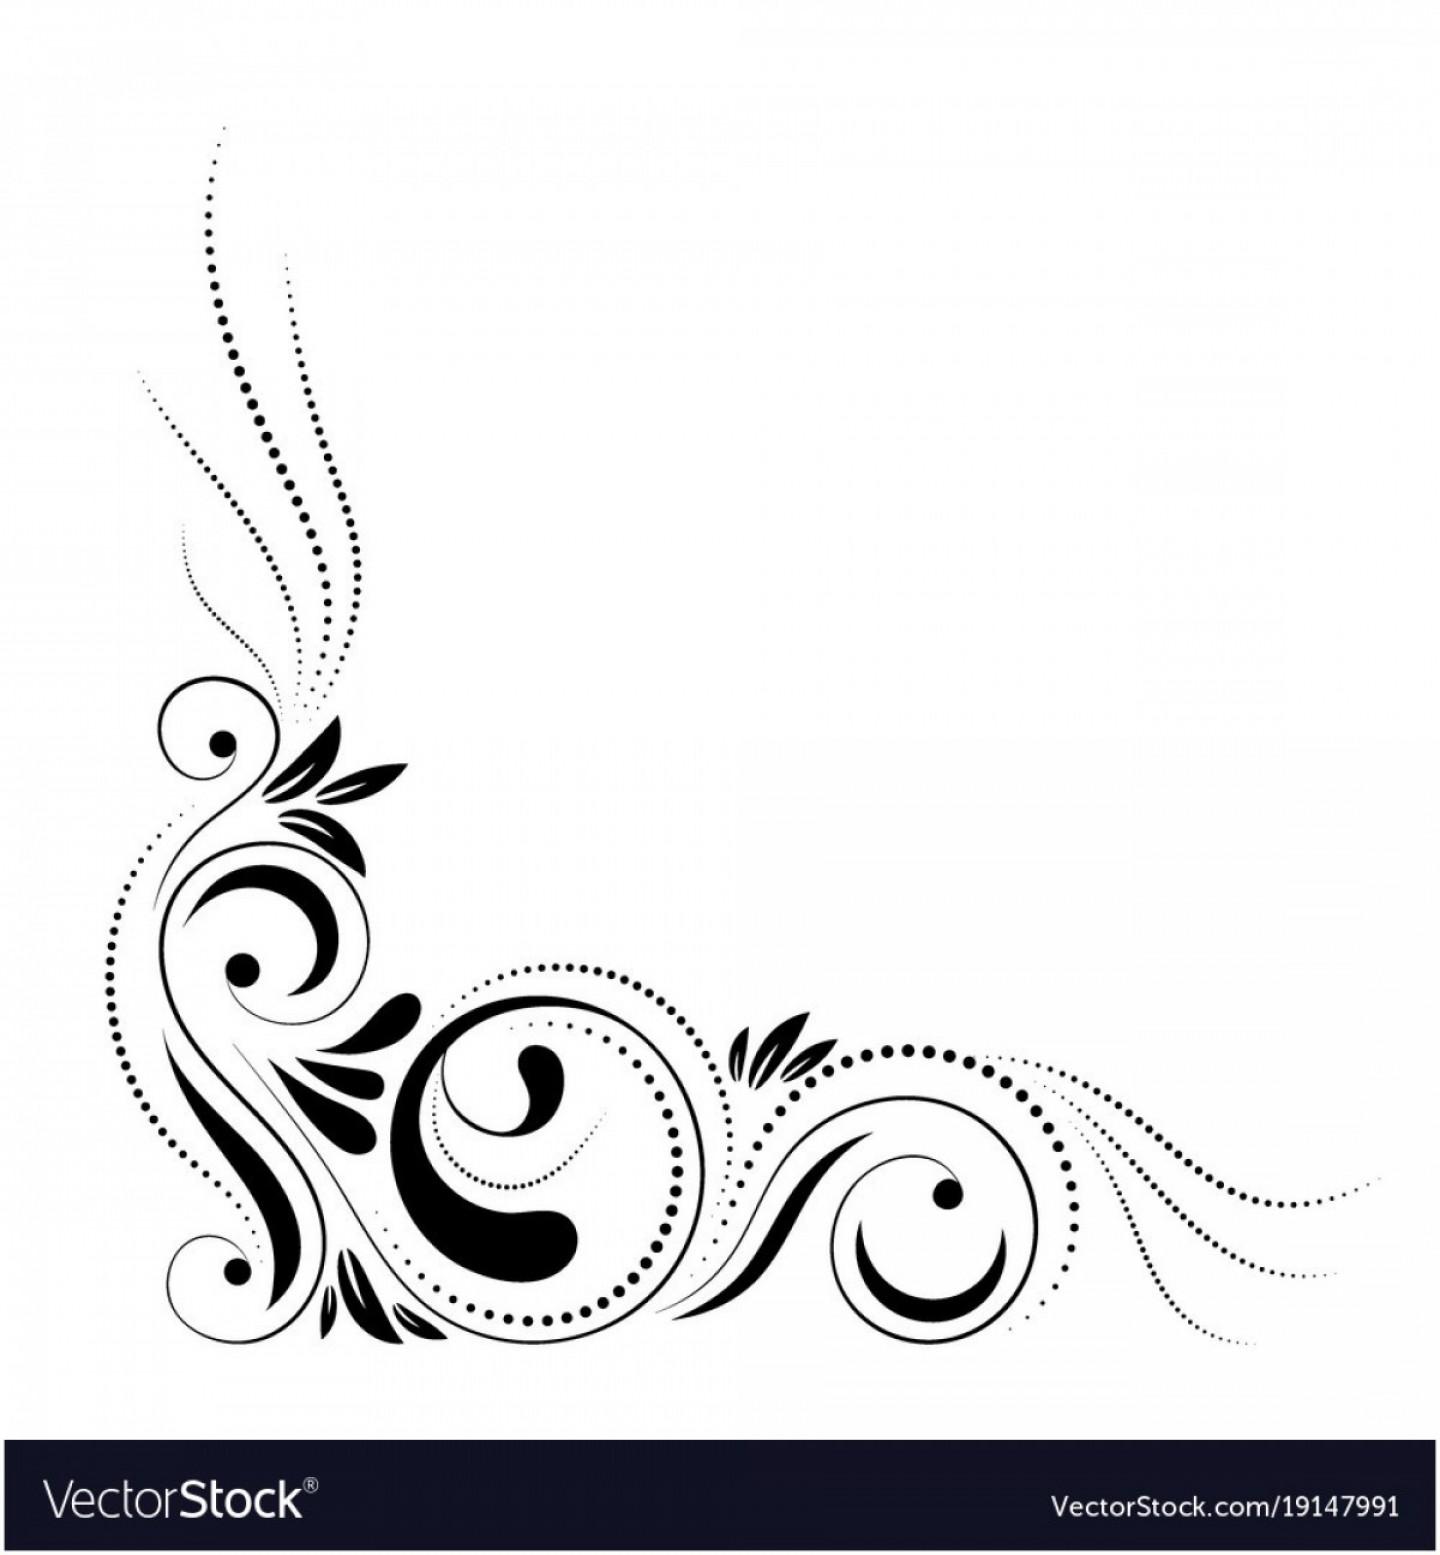 Swirl Graphic Hd Picture Art Design Clipart Red Border Clipart New.